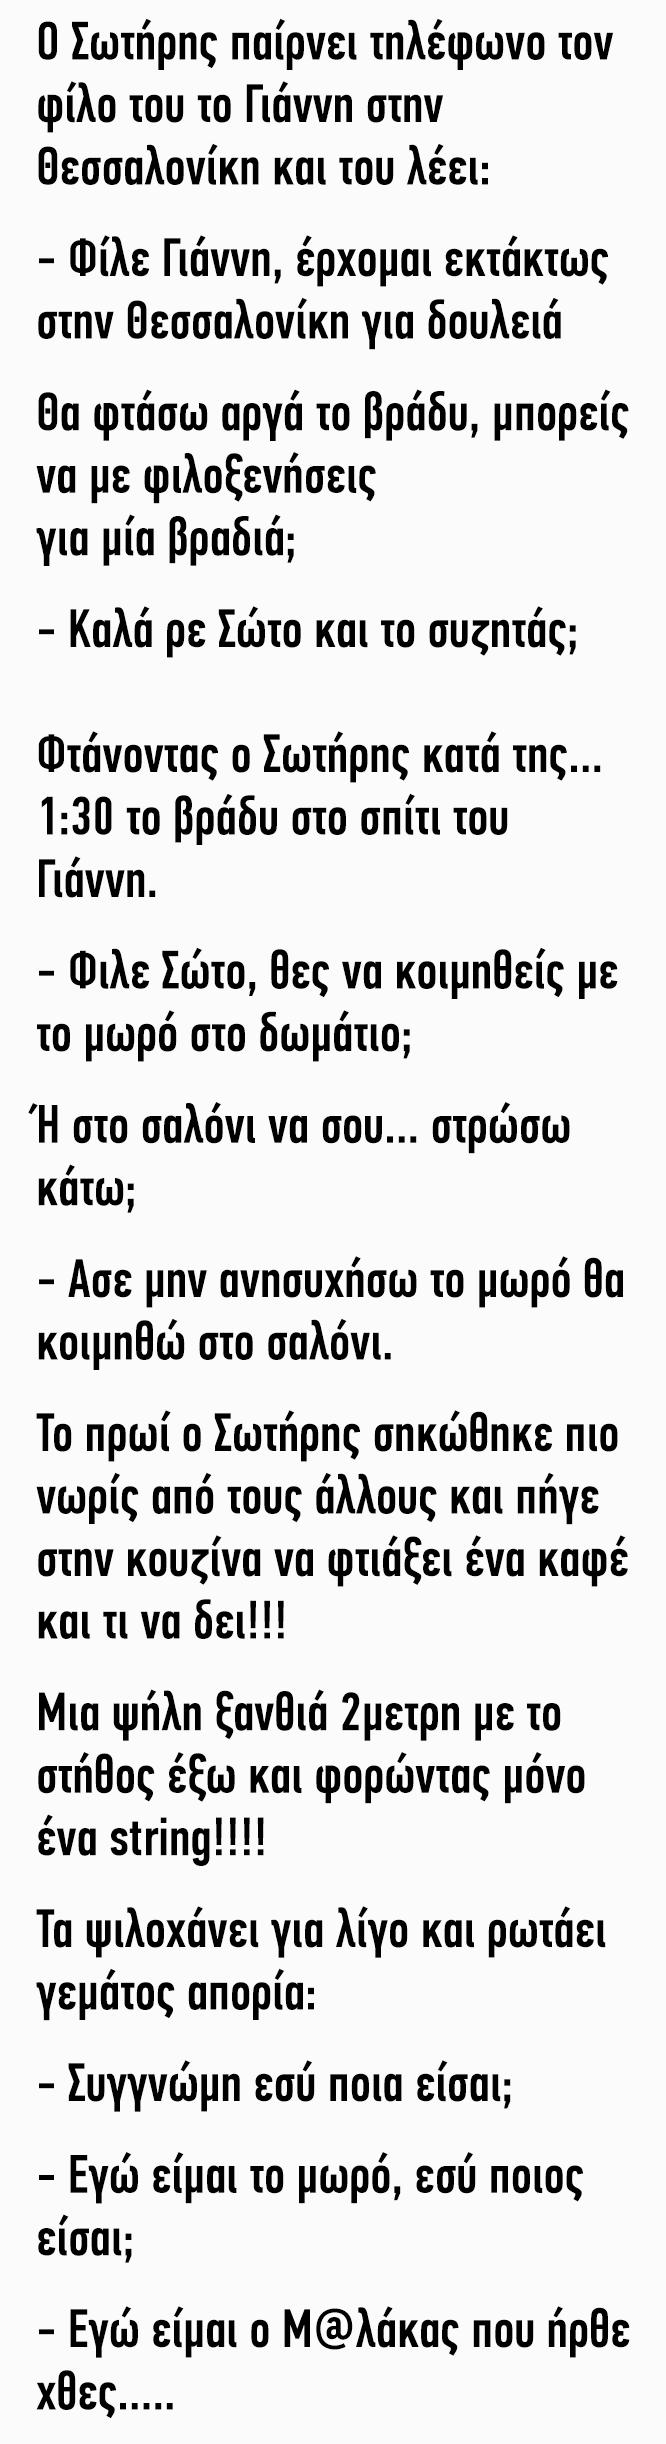 IMG_0437